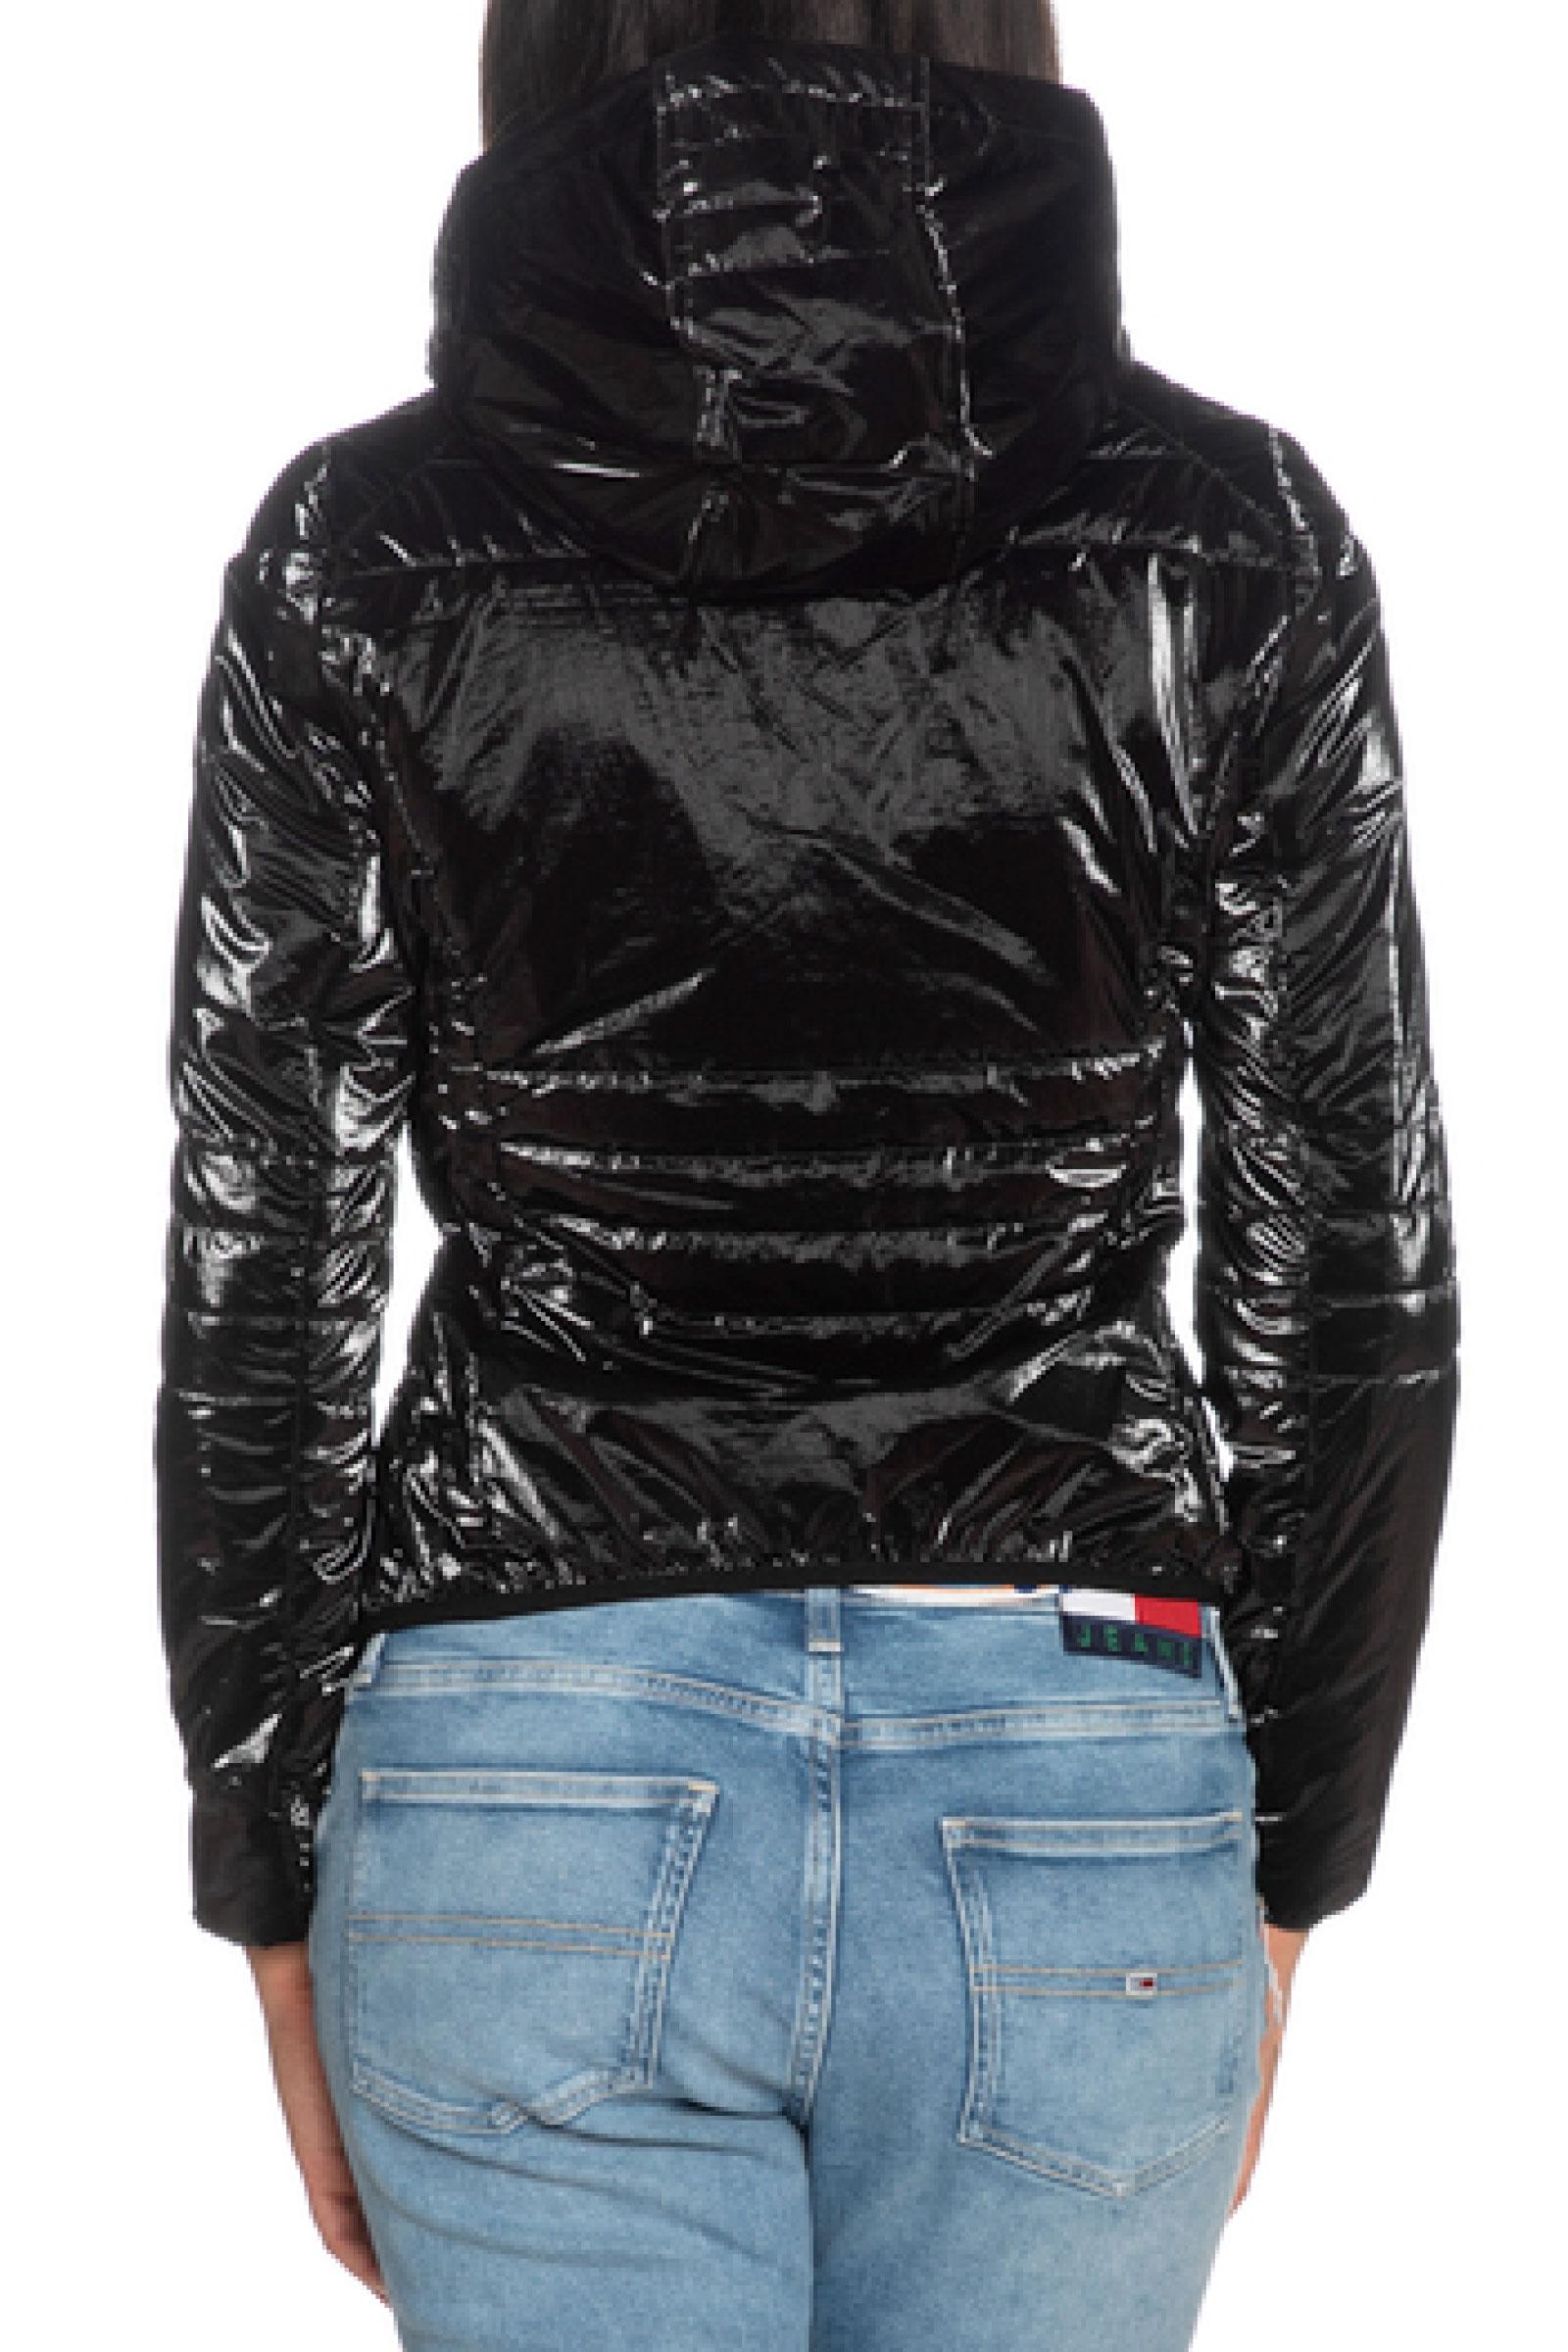 YES ZEE Woman Jacket YES.ZEE | Jacket | J407 QP000801